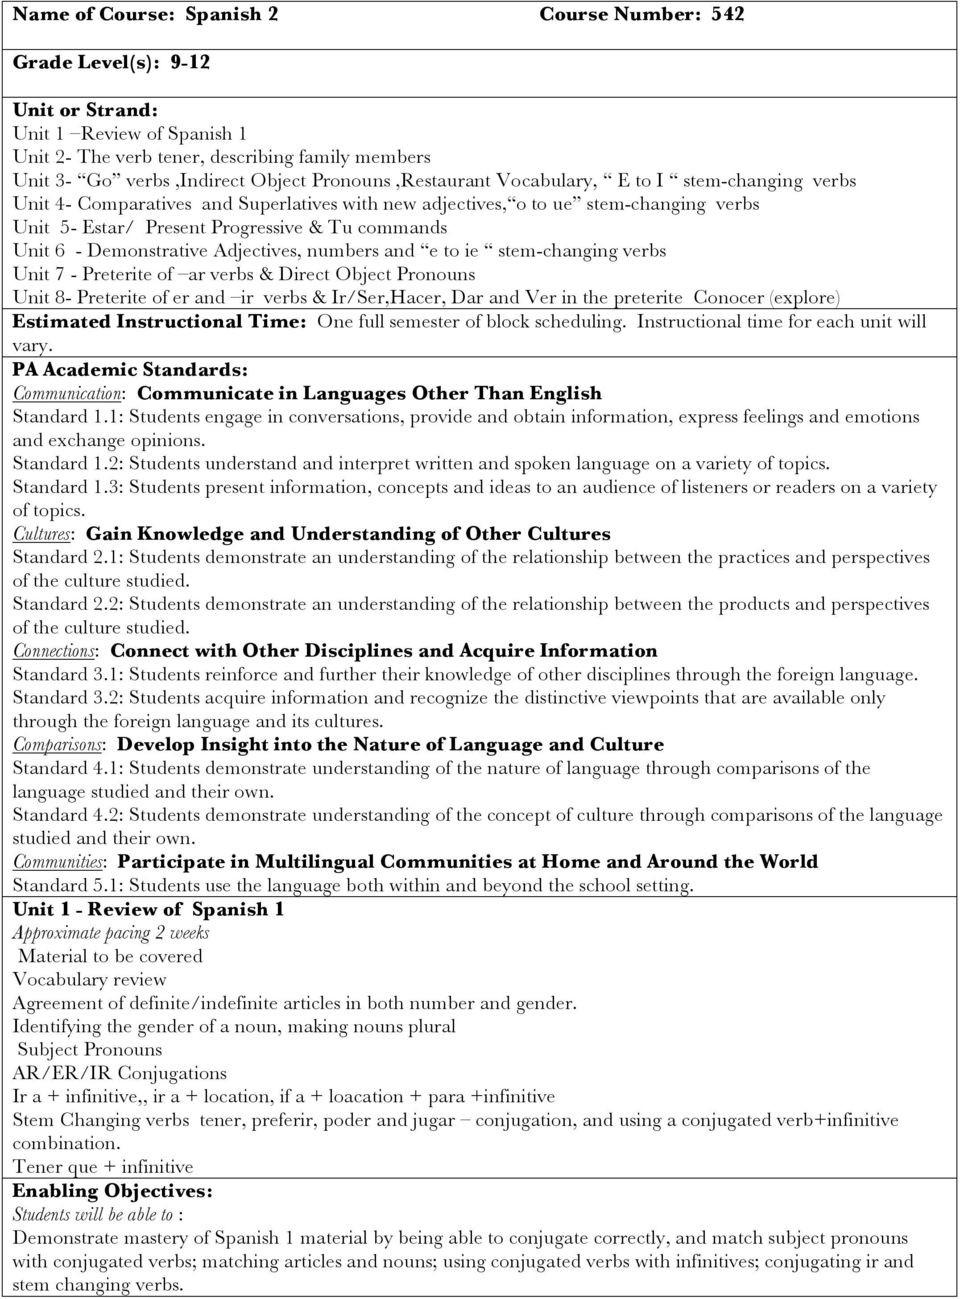 Stem Changing Verbs Worksheet Answers Stem Changing Verbs In Spanish Worksheet Answers